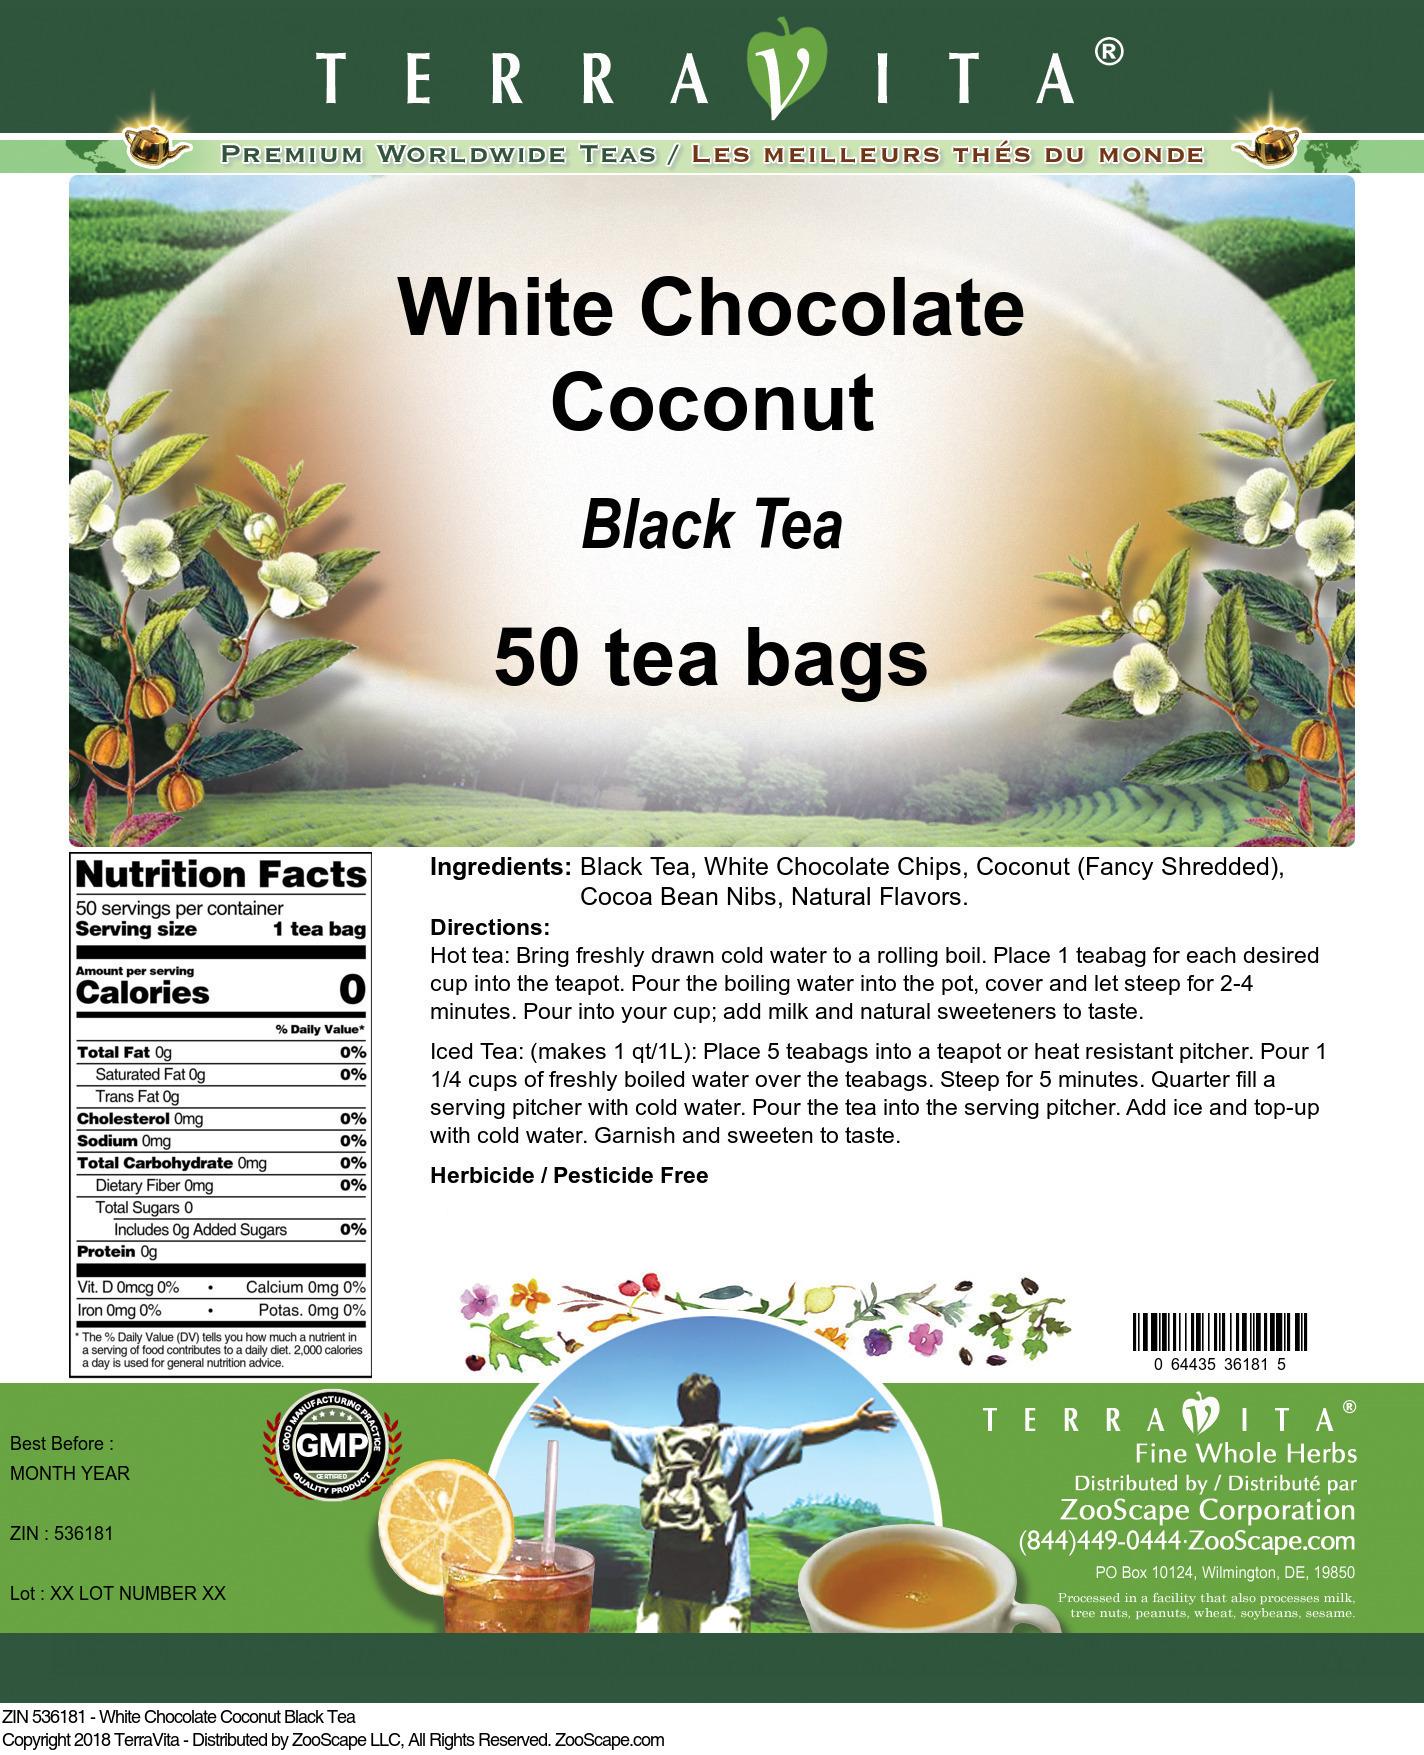 White Chocolate Coconut Black Tea